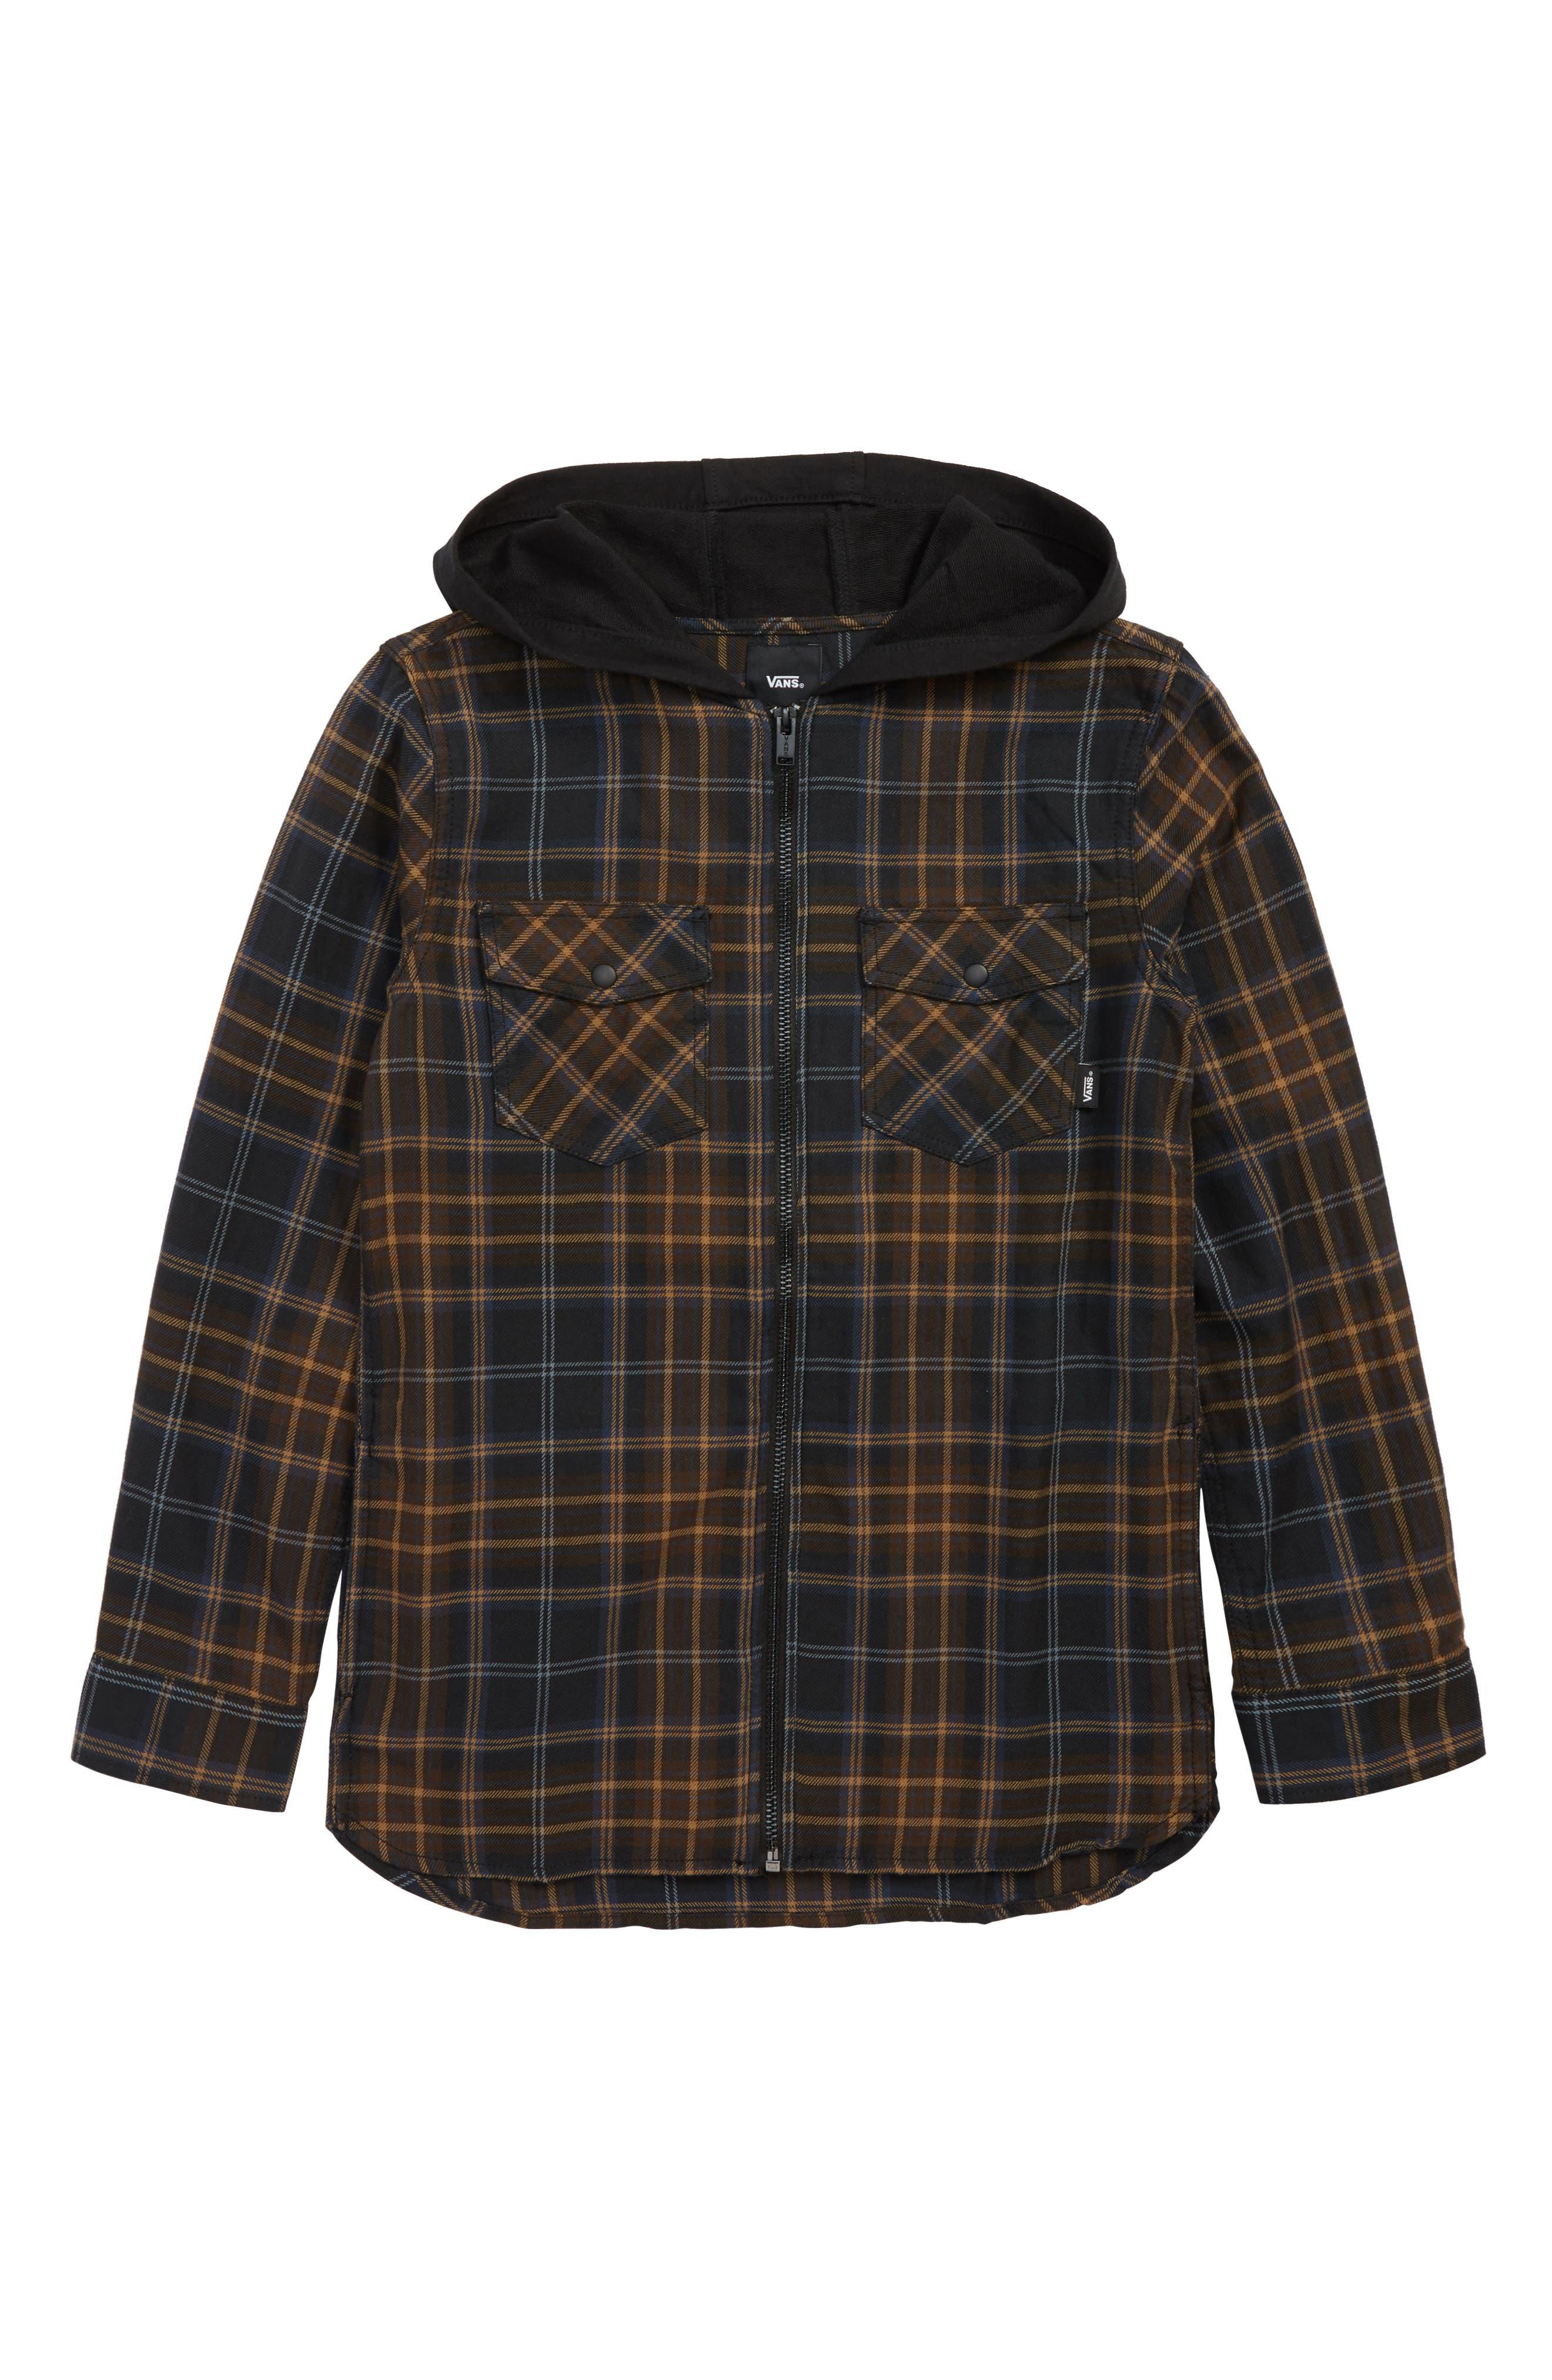 Higgins Zip Flannel Shirt,                             Main thumbnail 1, color,                             BLACK DEMITASSE